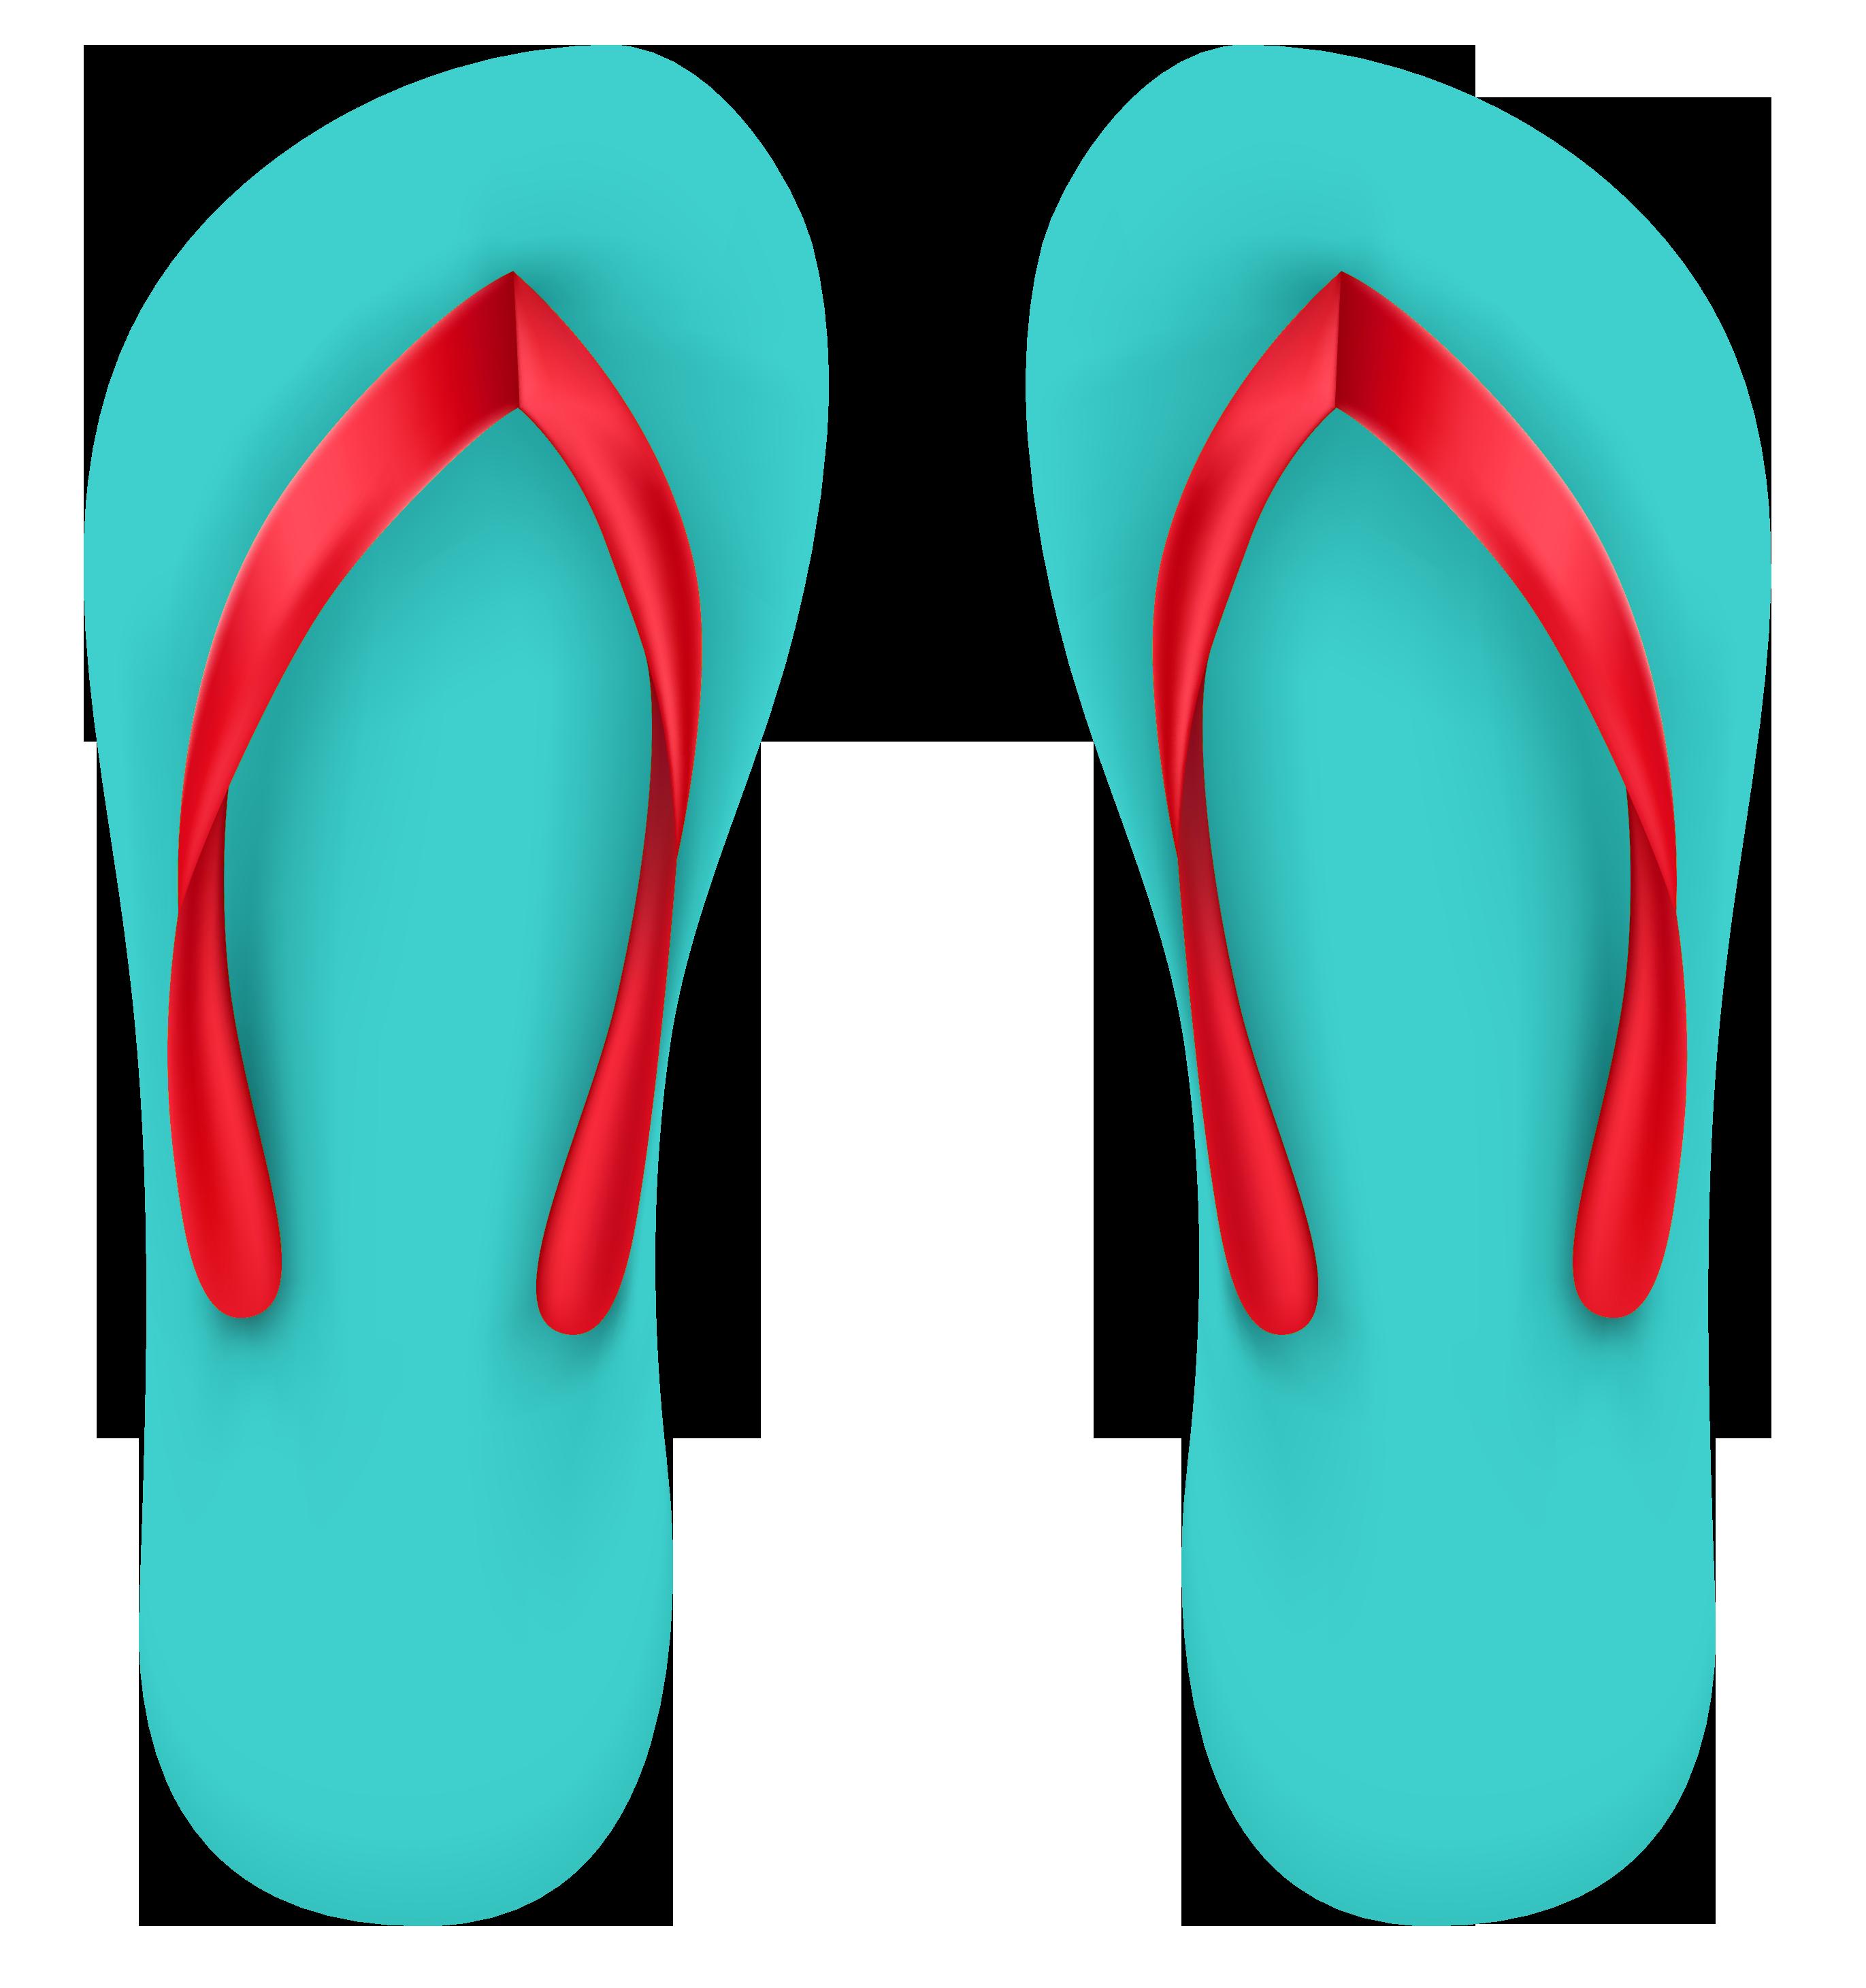 Aqua Weding Shoes 08 - Aqua Weding Shoes